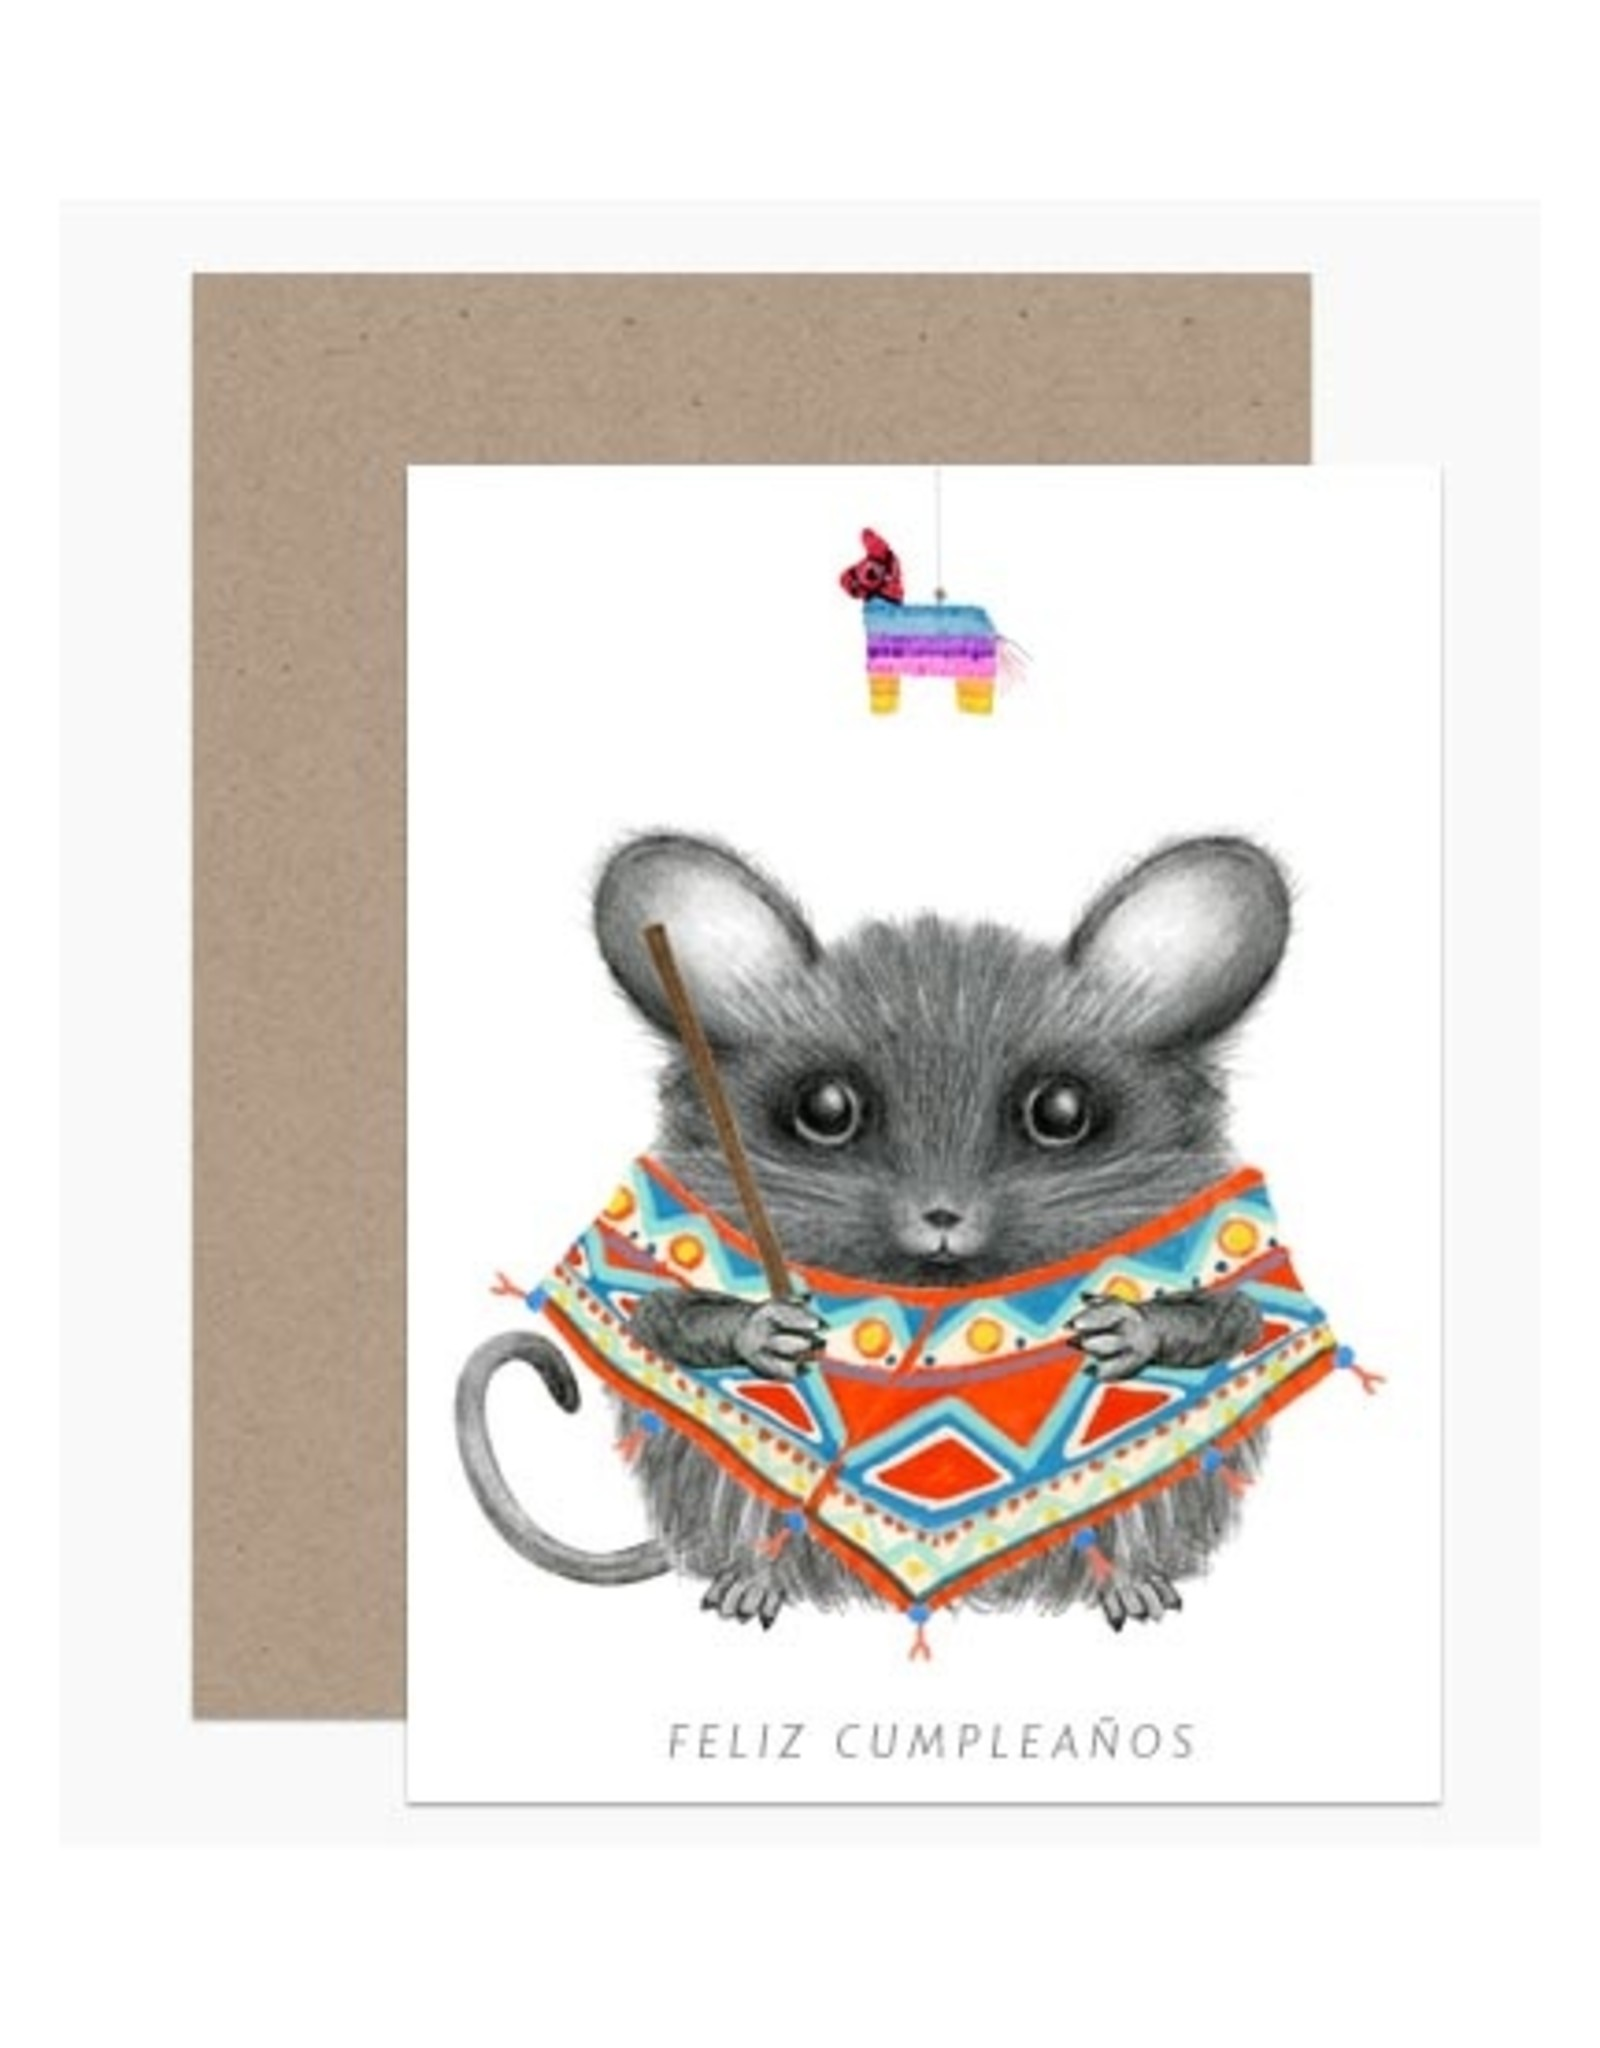 Feliz Cumpleanos Birthday Mouse Greeting Card